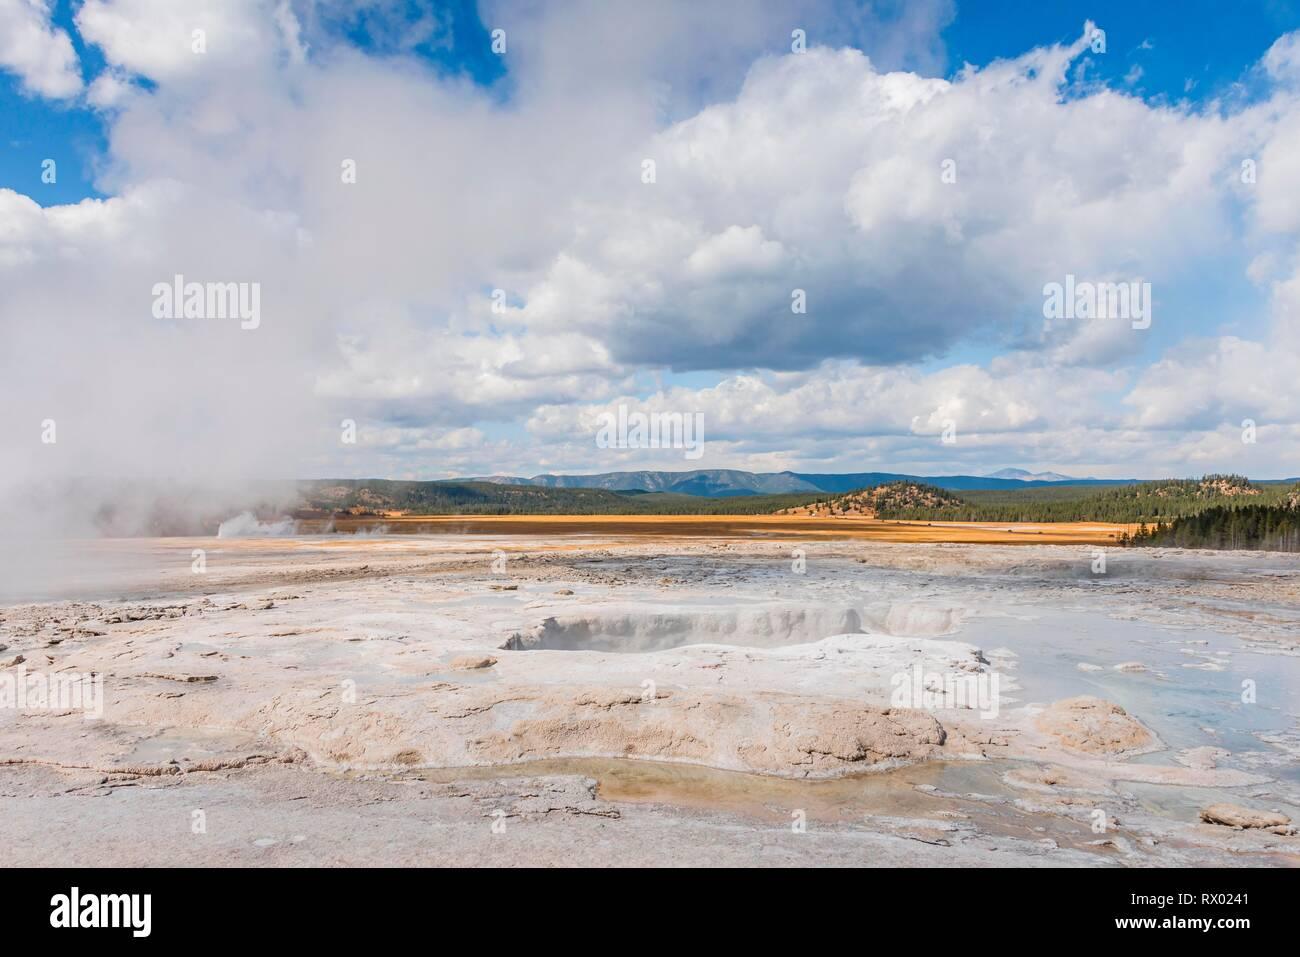 Steaming Hot Spring, Black Sand Basin, Yellowstone National Park, Wyoming, USA - Stock Image